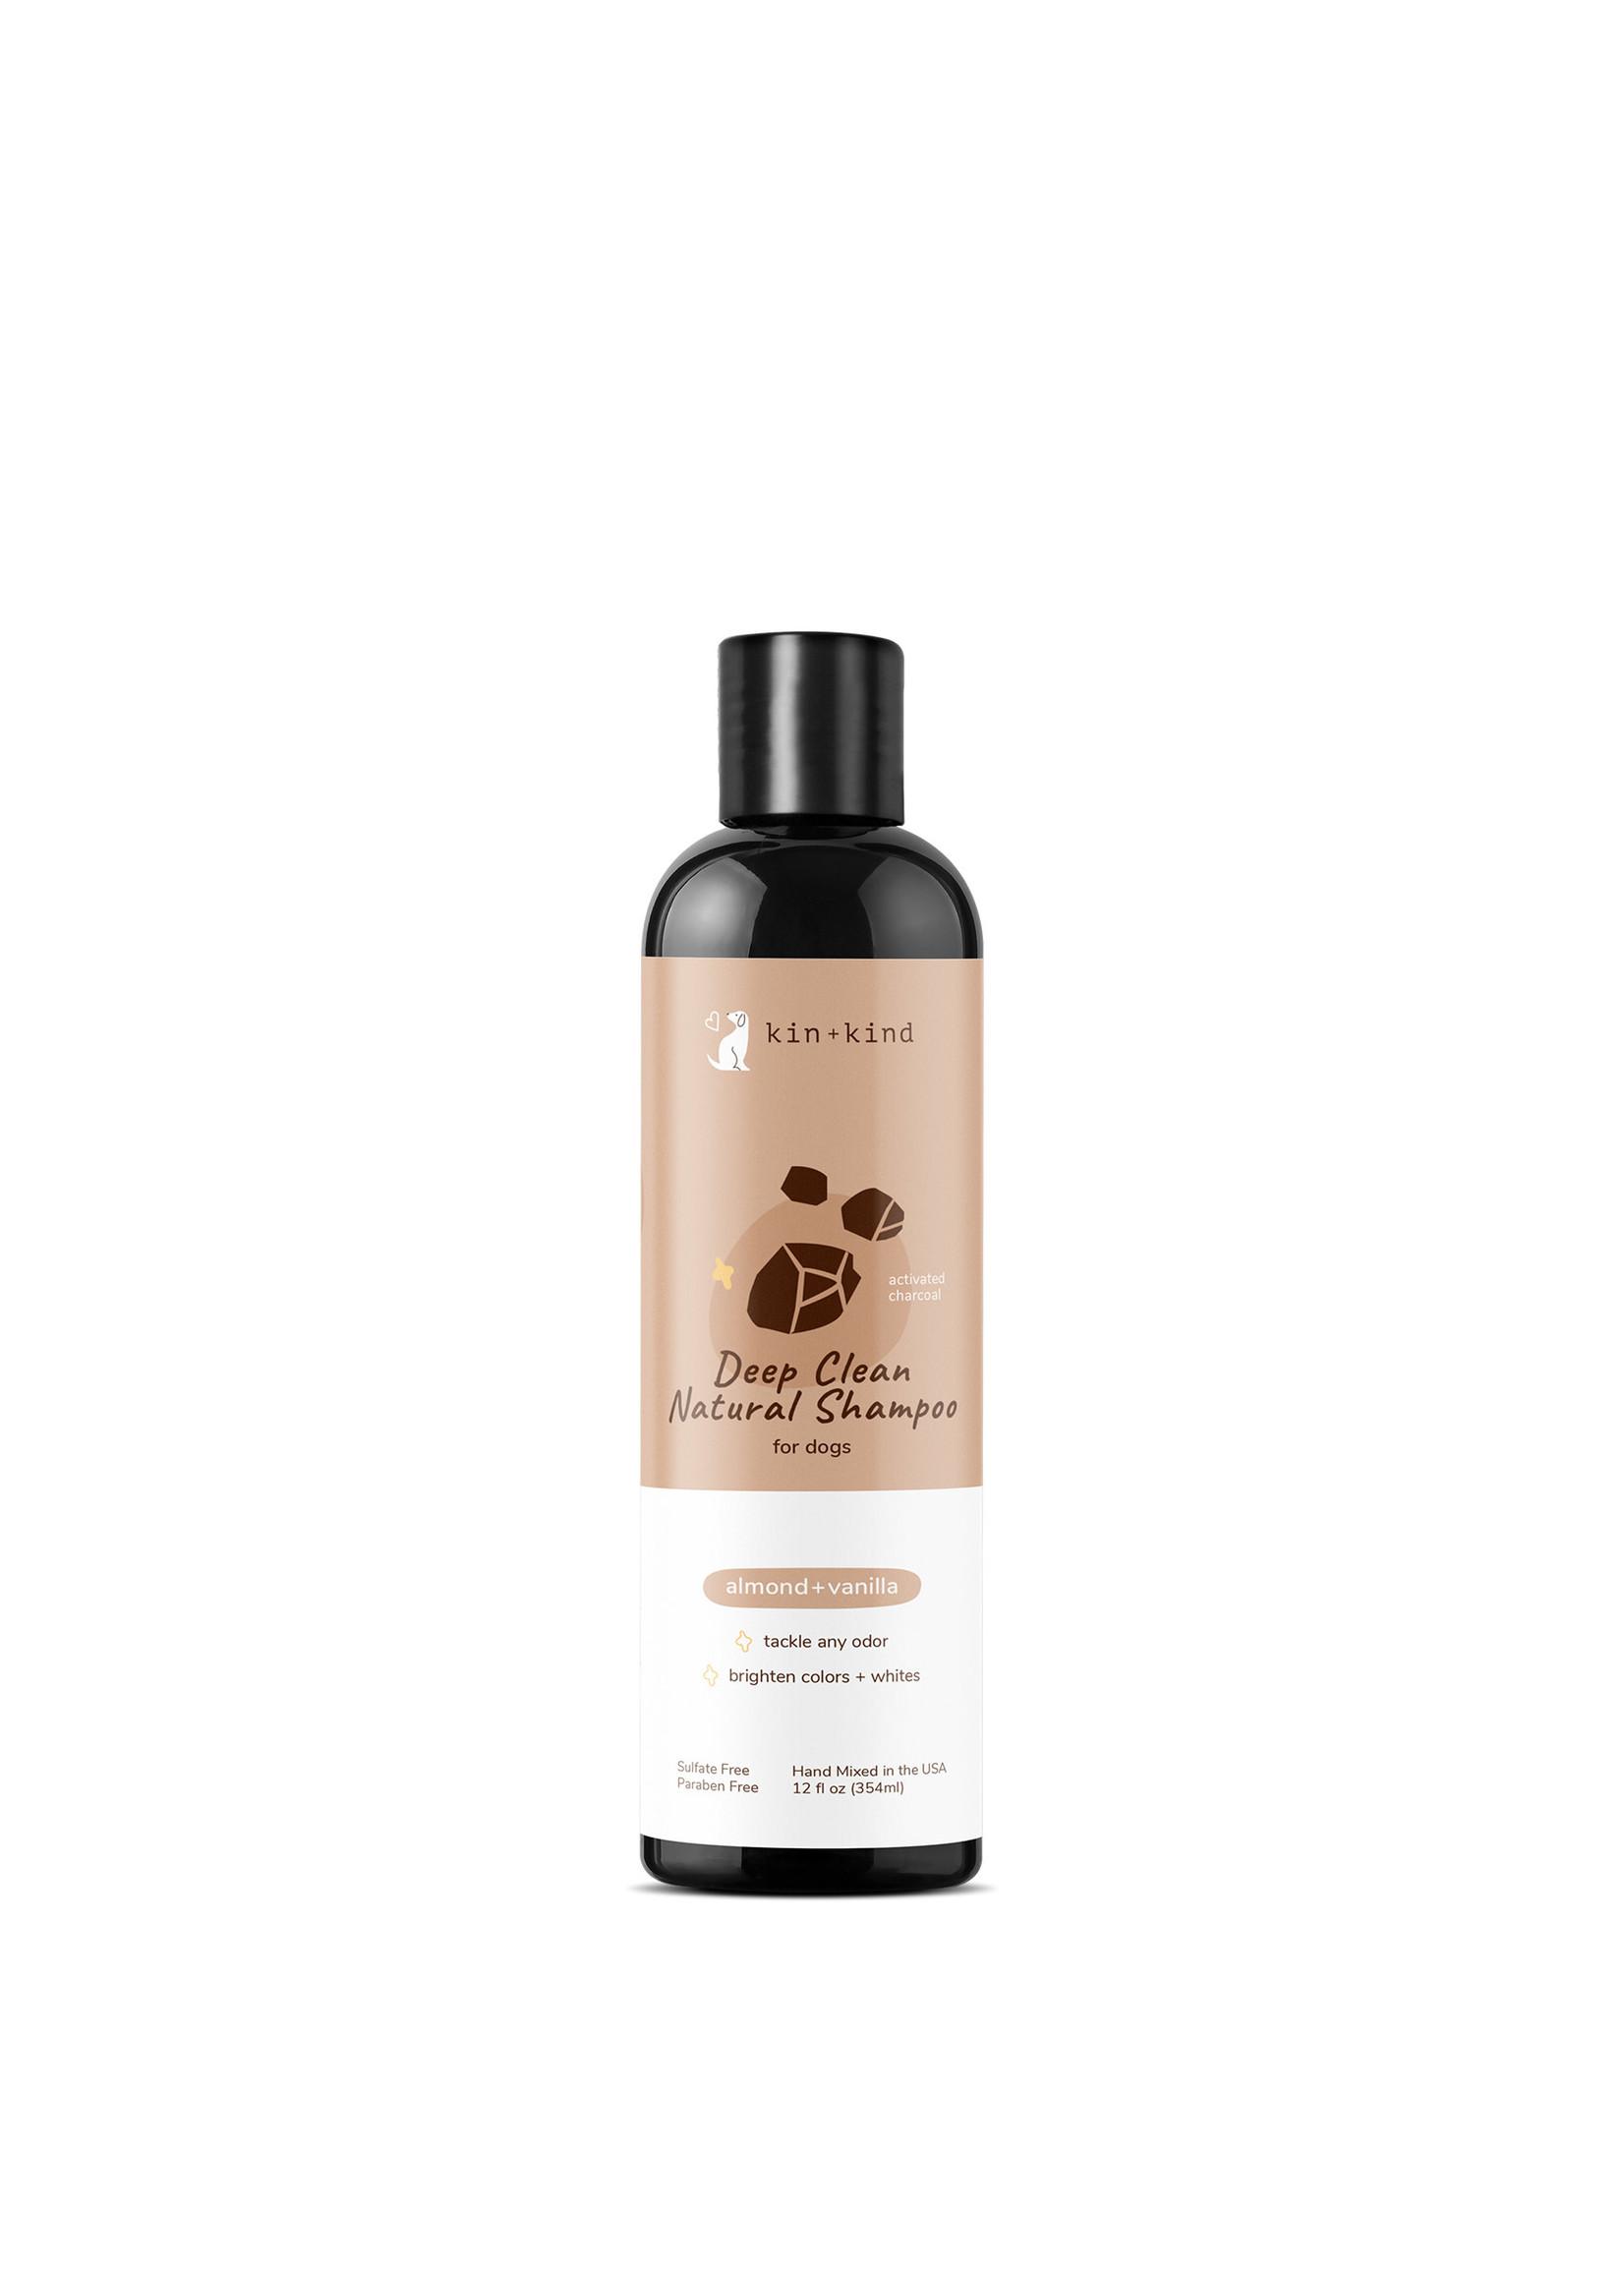 Kin + Kind Kin & Kind Deep Clean Almond and Vanilla Shampoo 12 oz